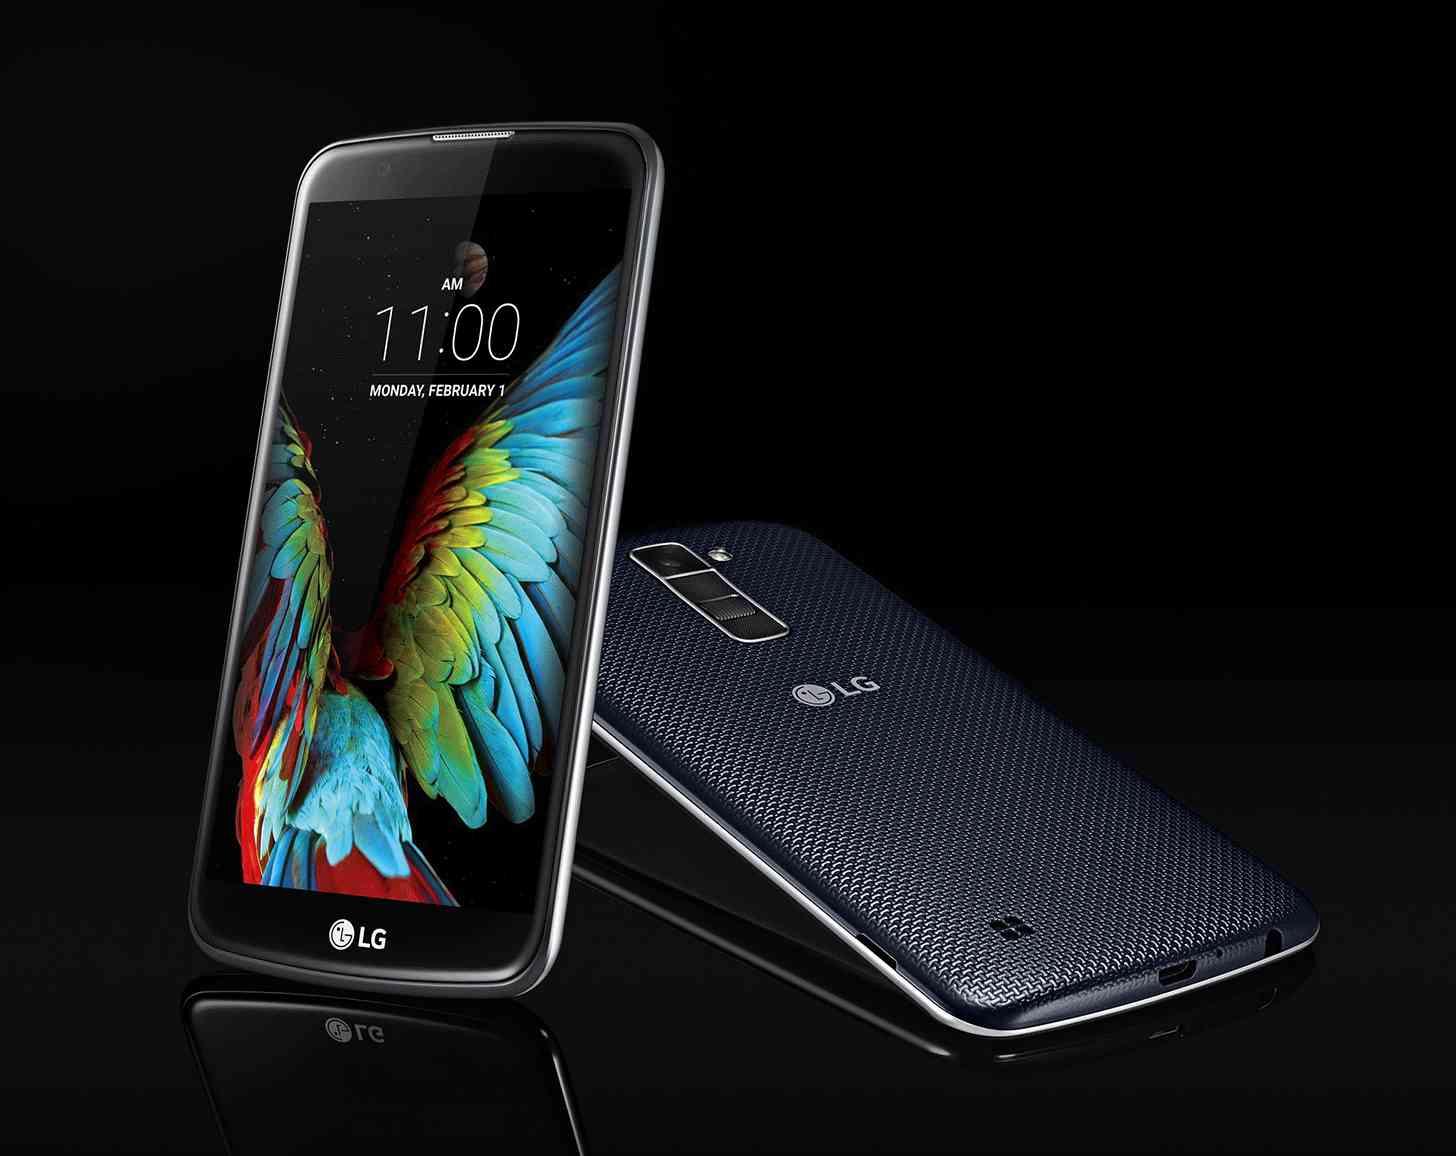 LG K10 K Series Android phone